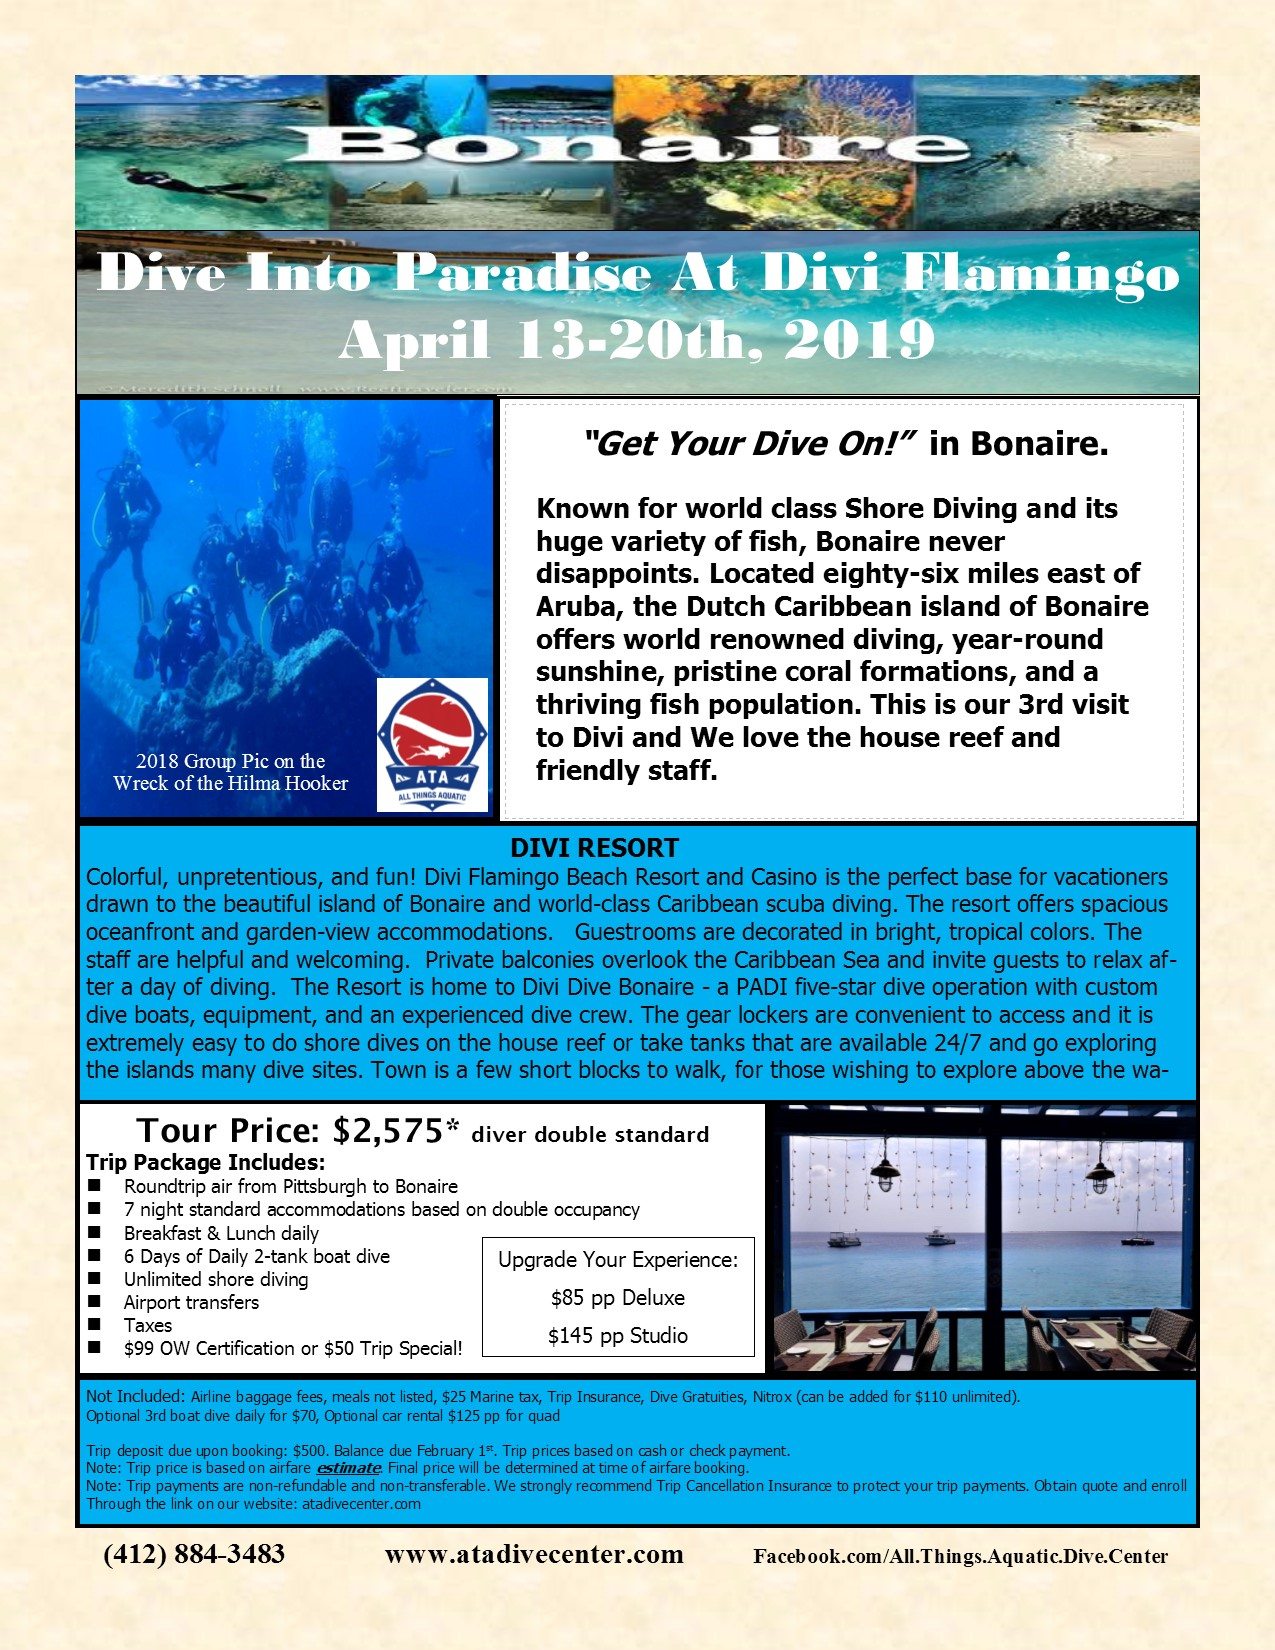 Divi Flamingo Resorts & Casino, Bonaire April 13th-20th, 2019